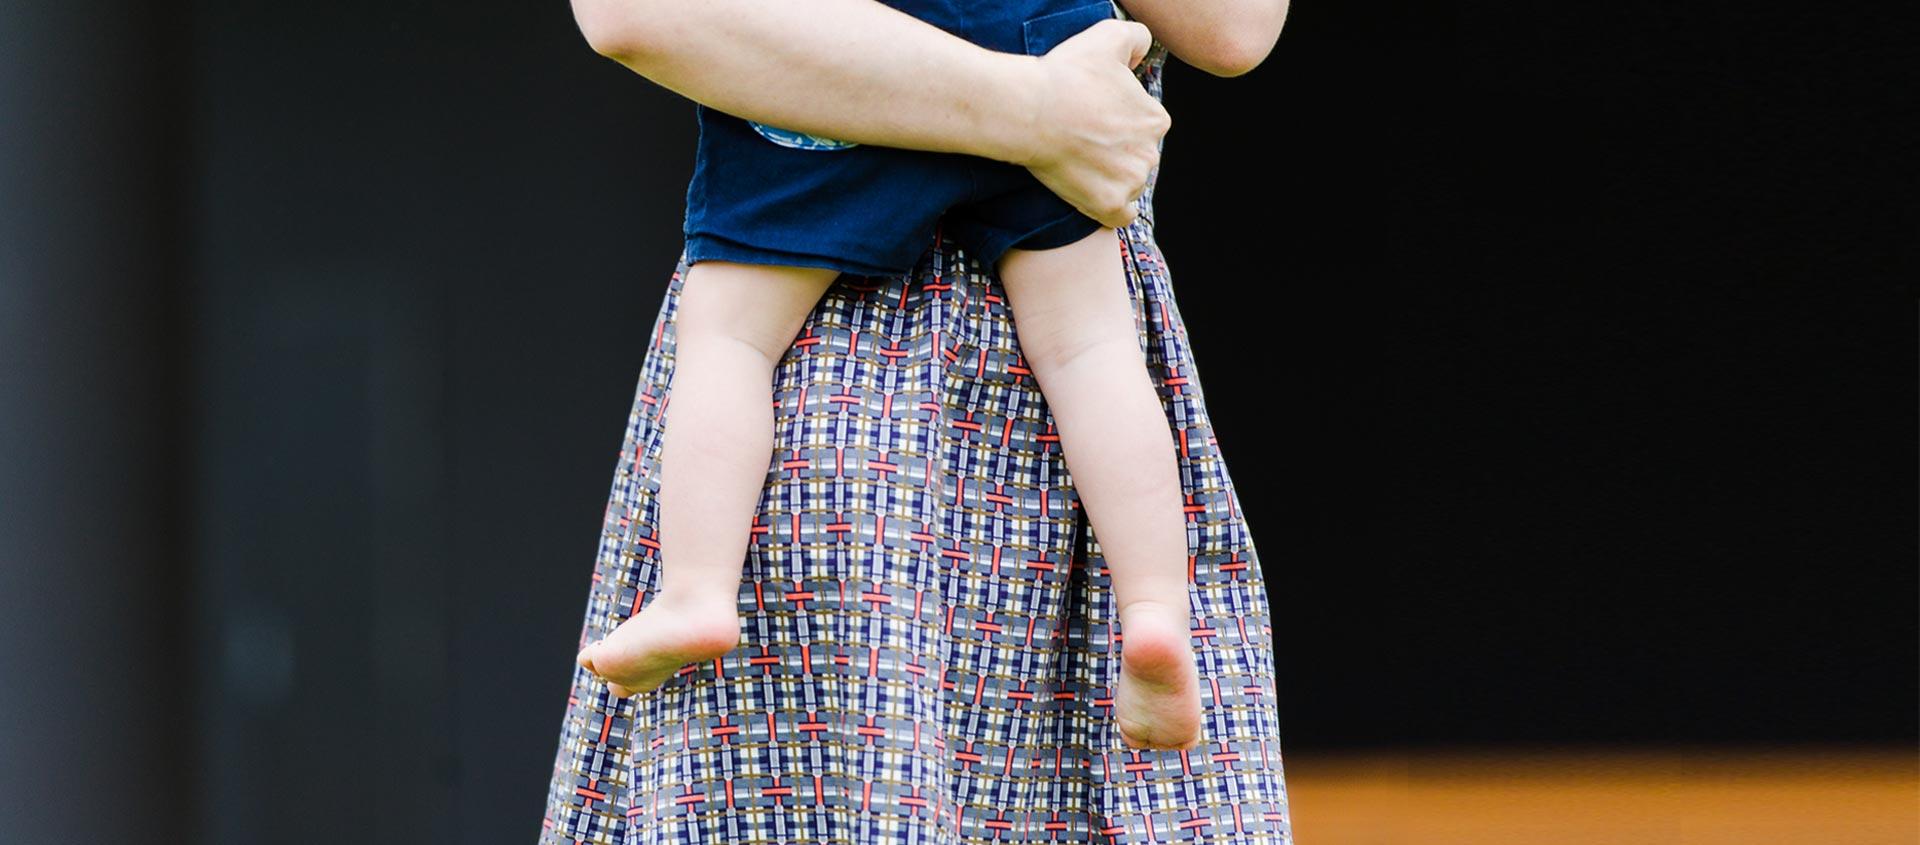 Melbourne Paediatric Specialists